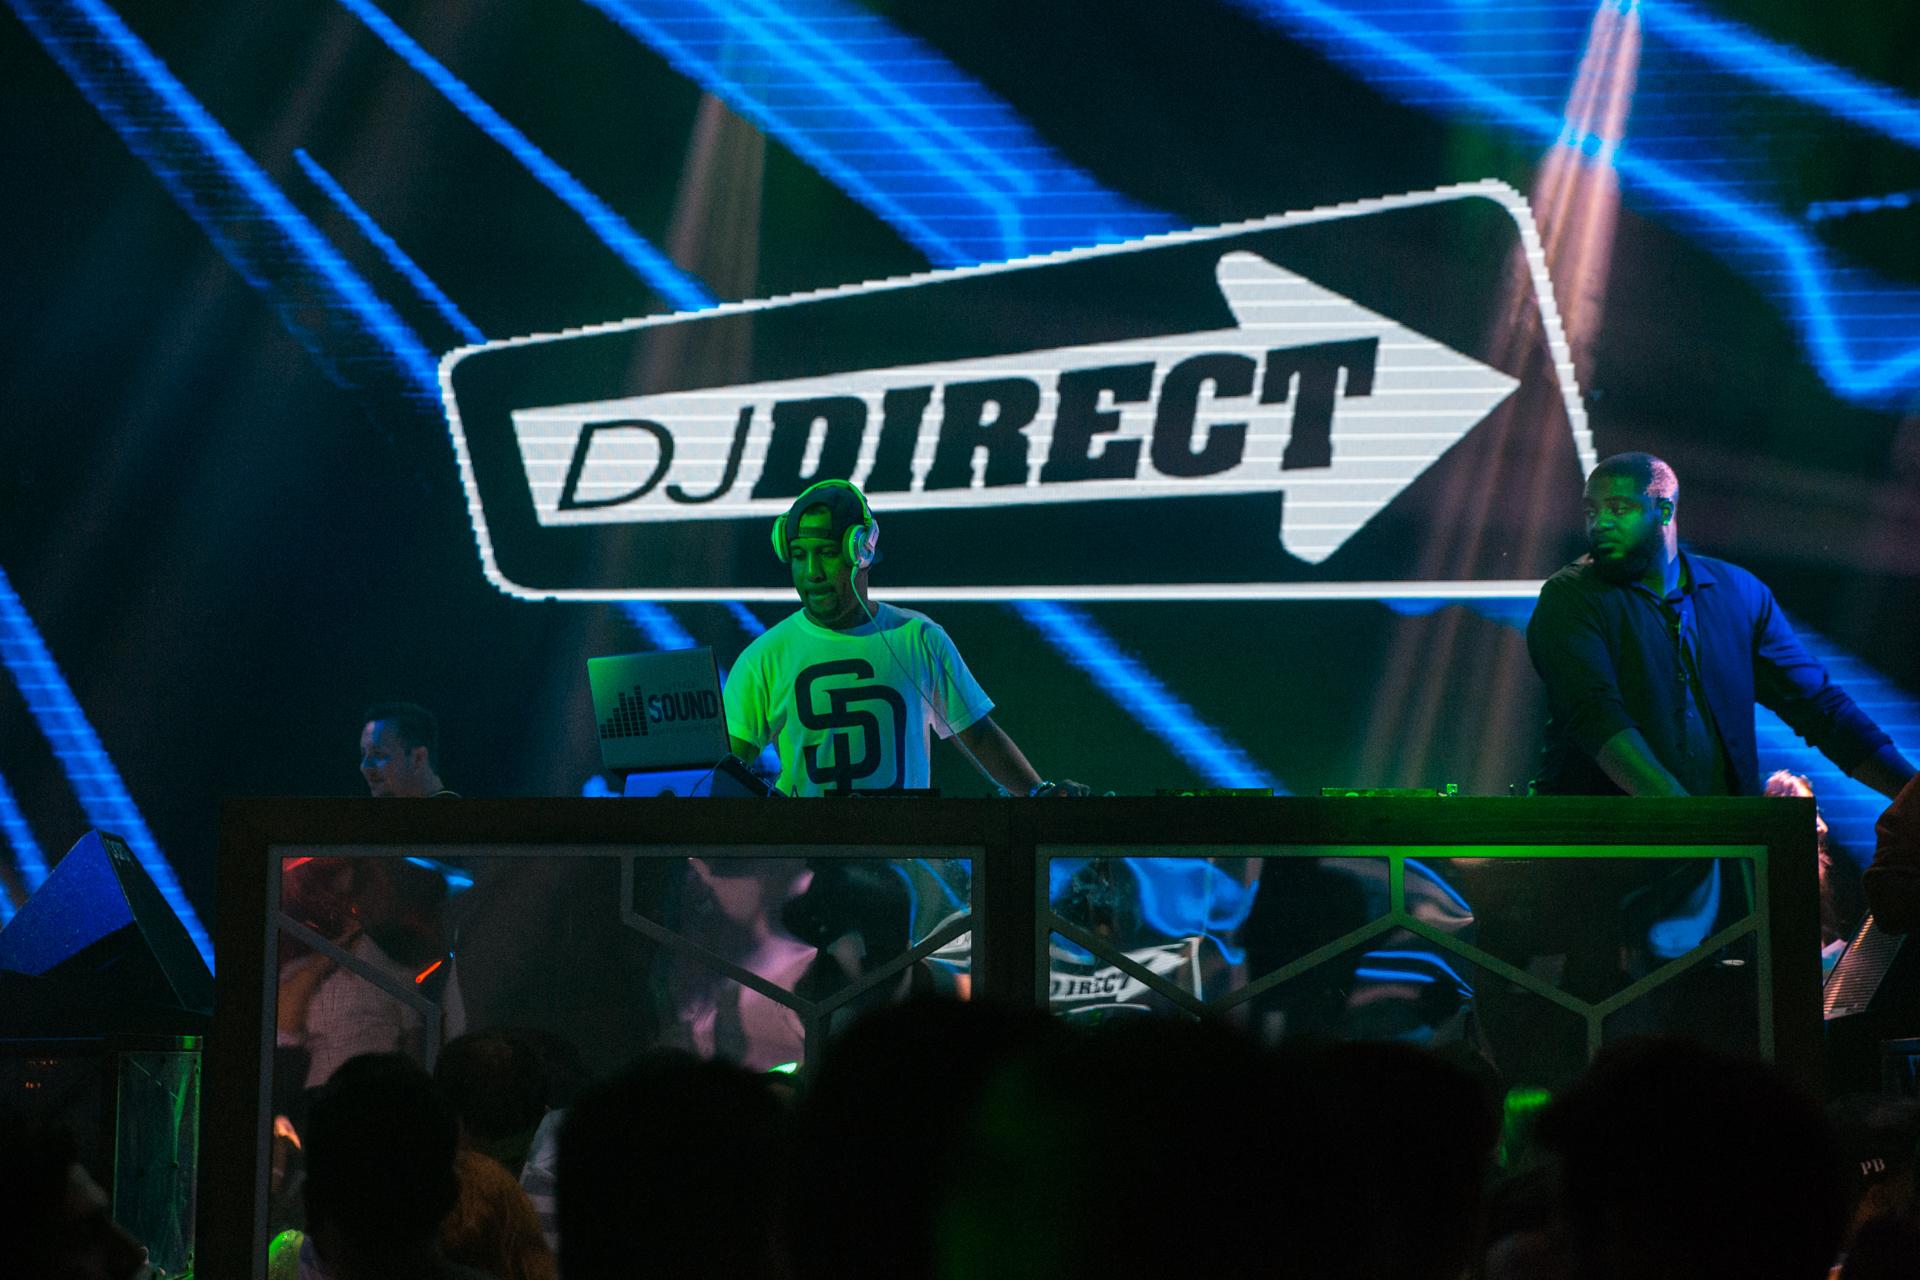 09.16.17 Parq - Direct--1.jpg